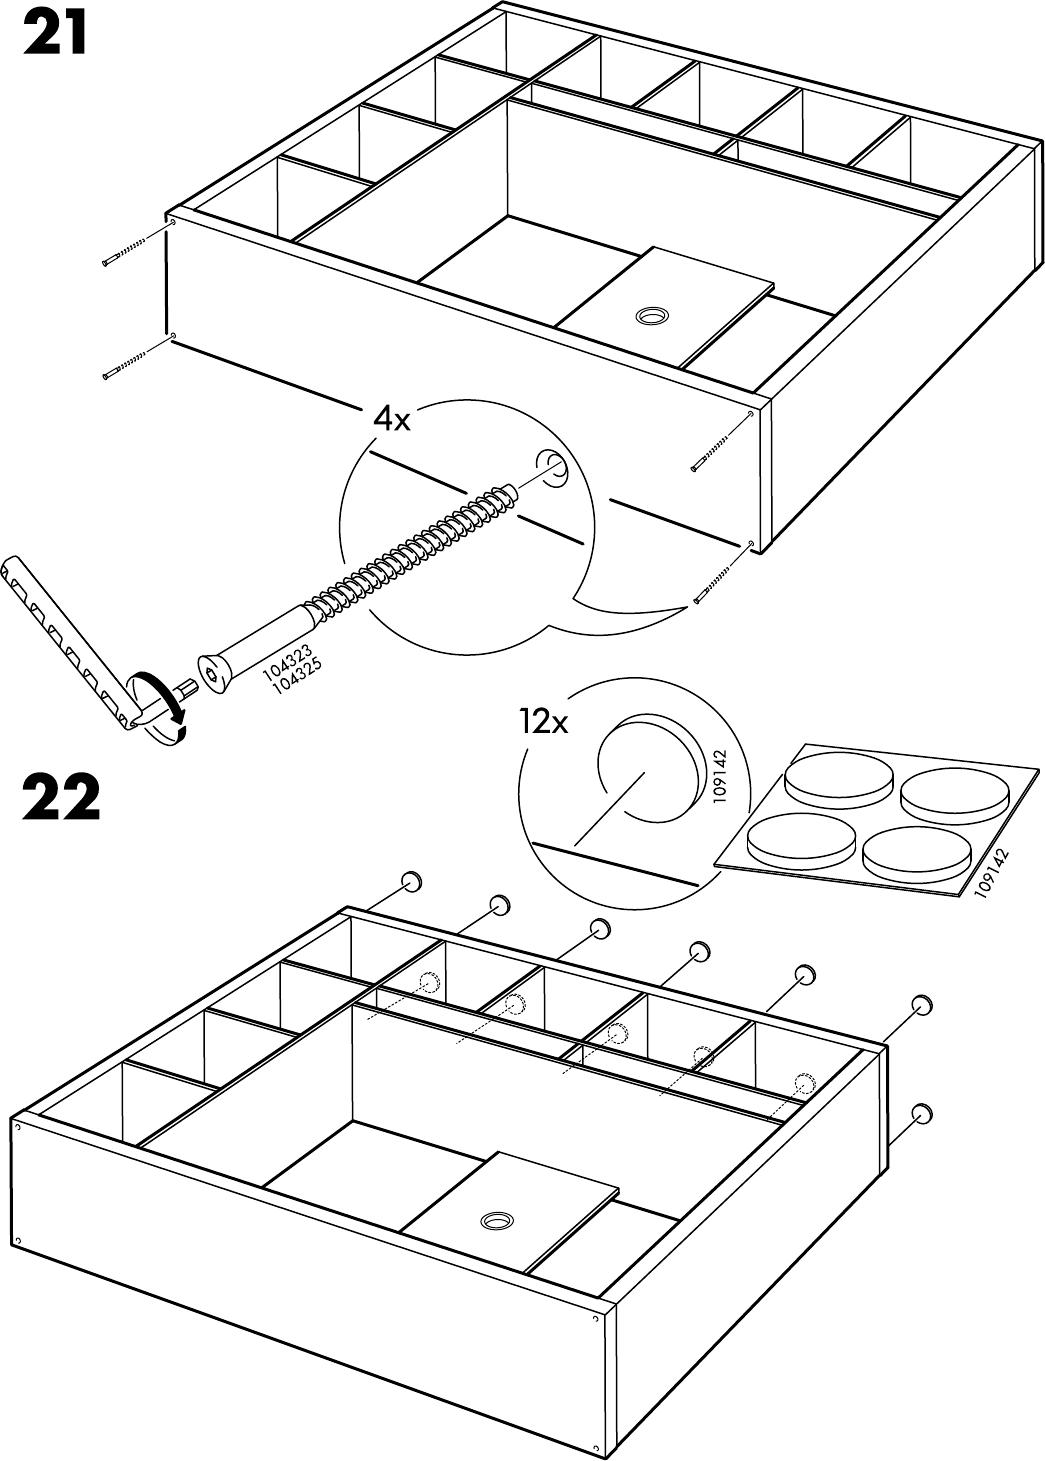 Expedit Tv Kast.Handleiding Ikea Expedit Tv Kast Pagina 21 Van 32 Alle Talen